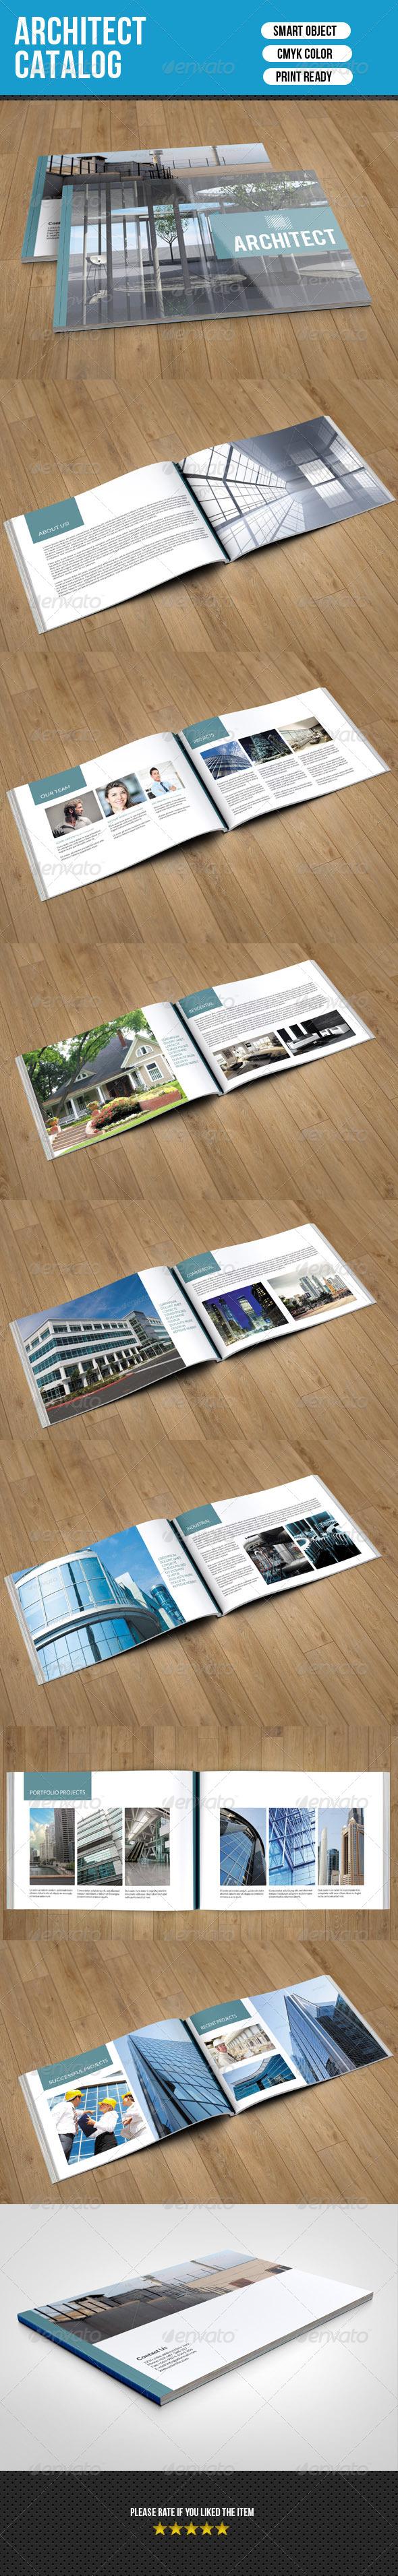 Architect Catalog Template-V05